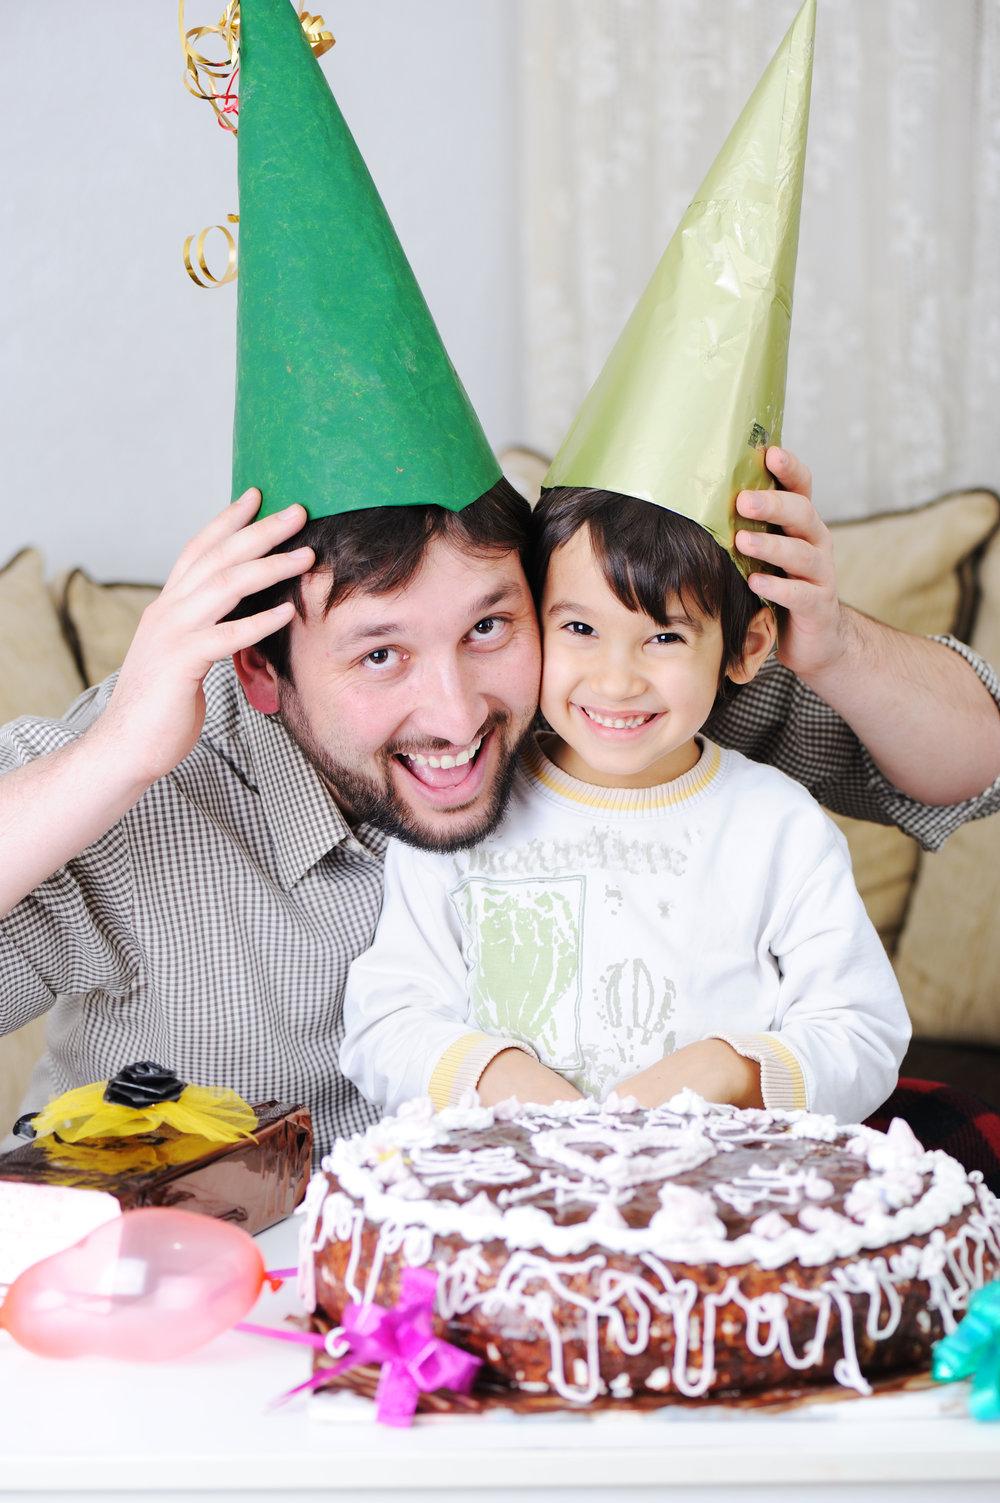 birthday-party_SFmk4VR4o.jpg